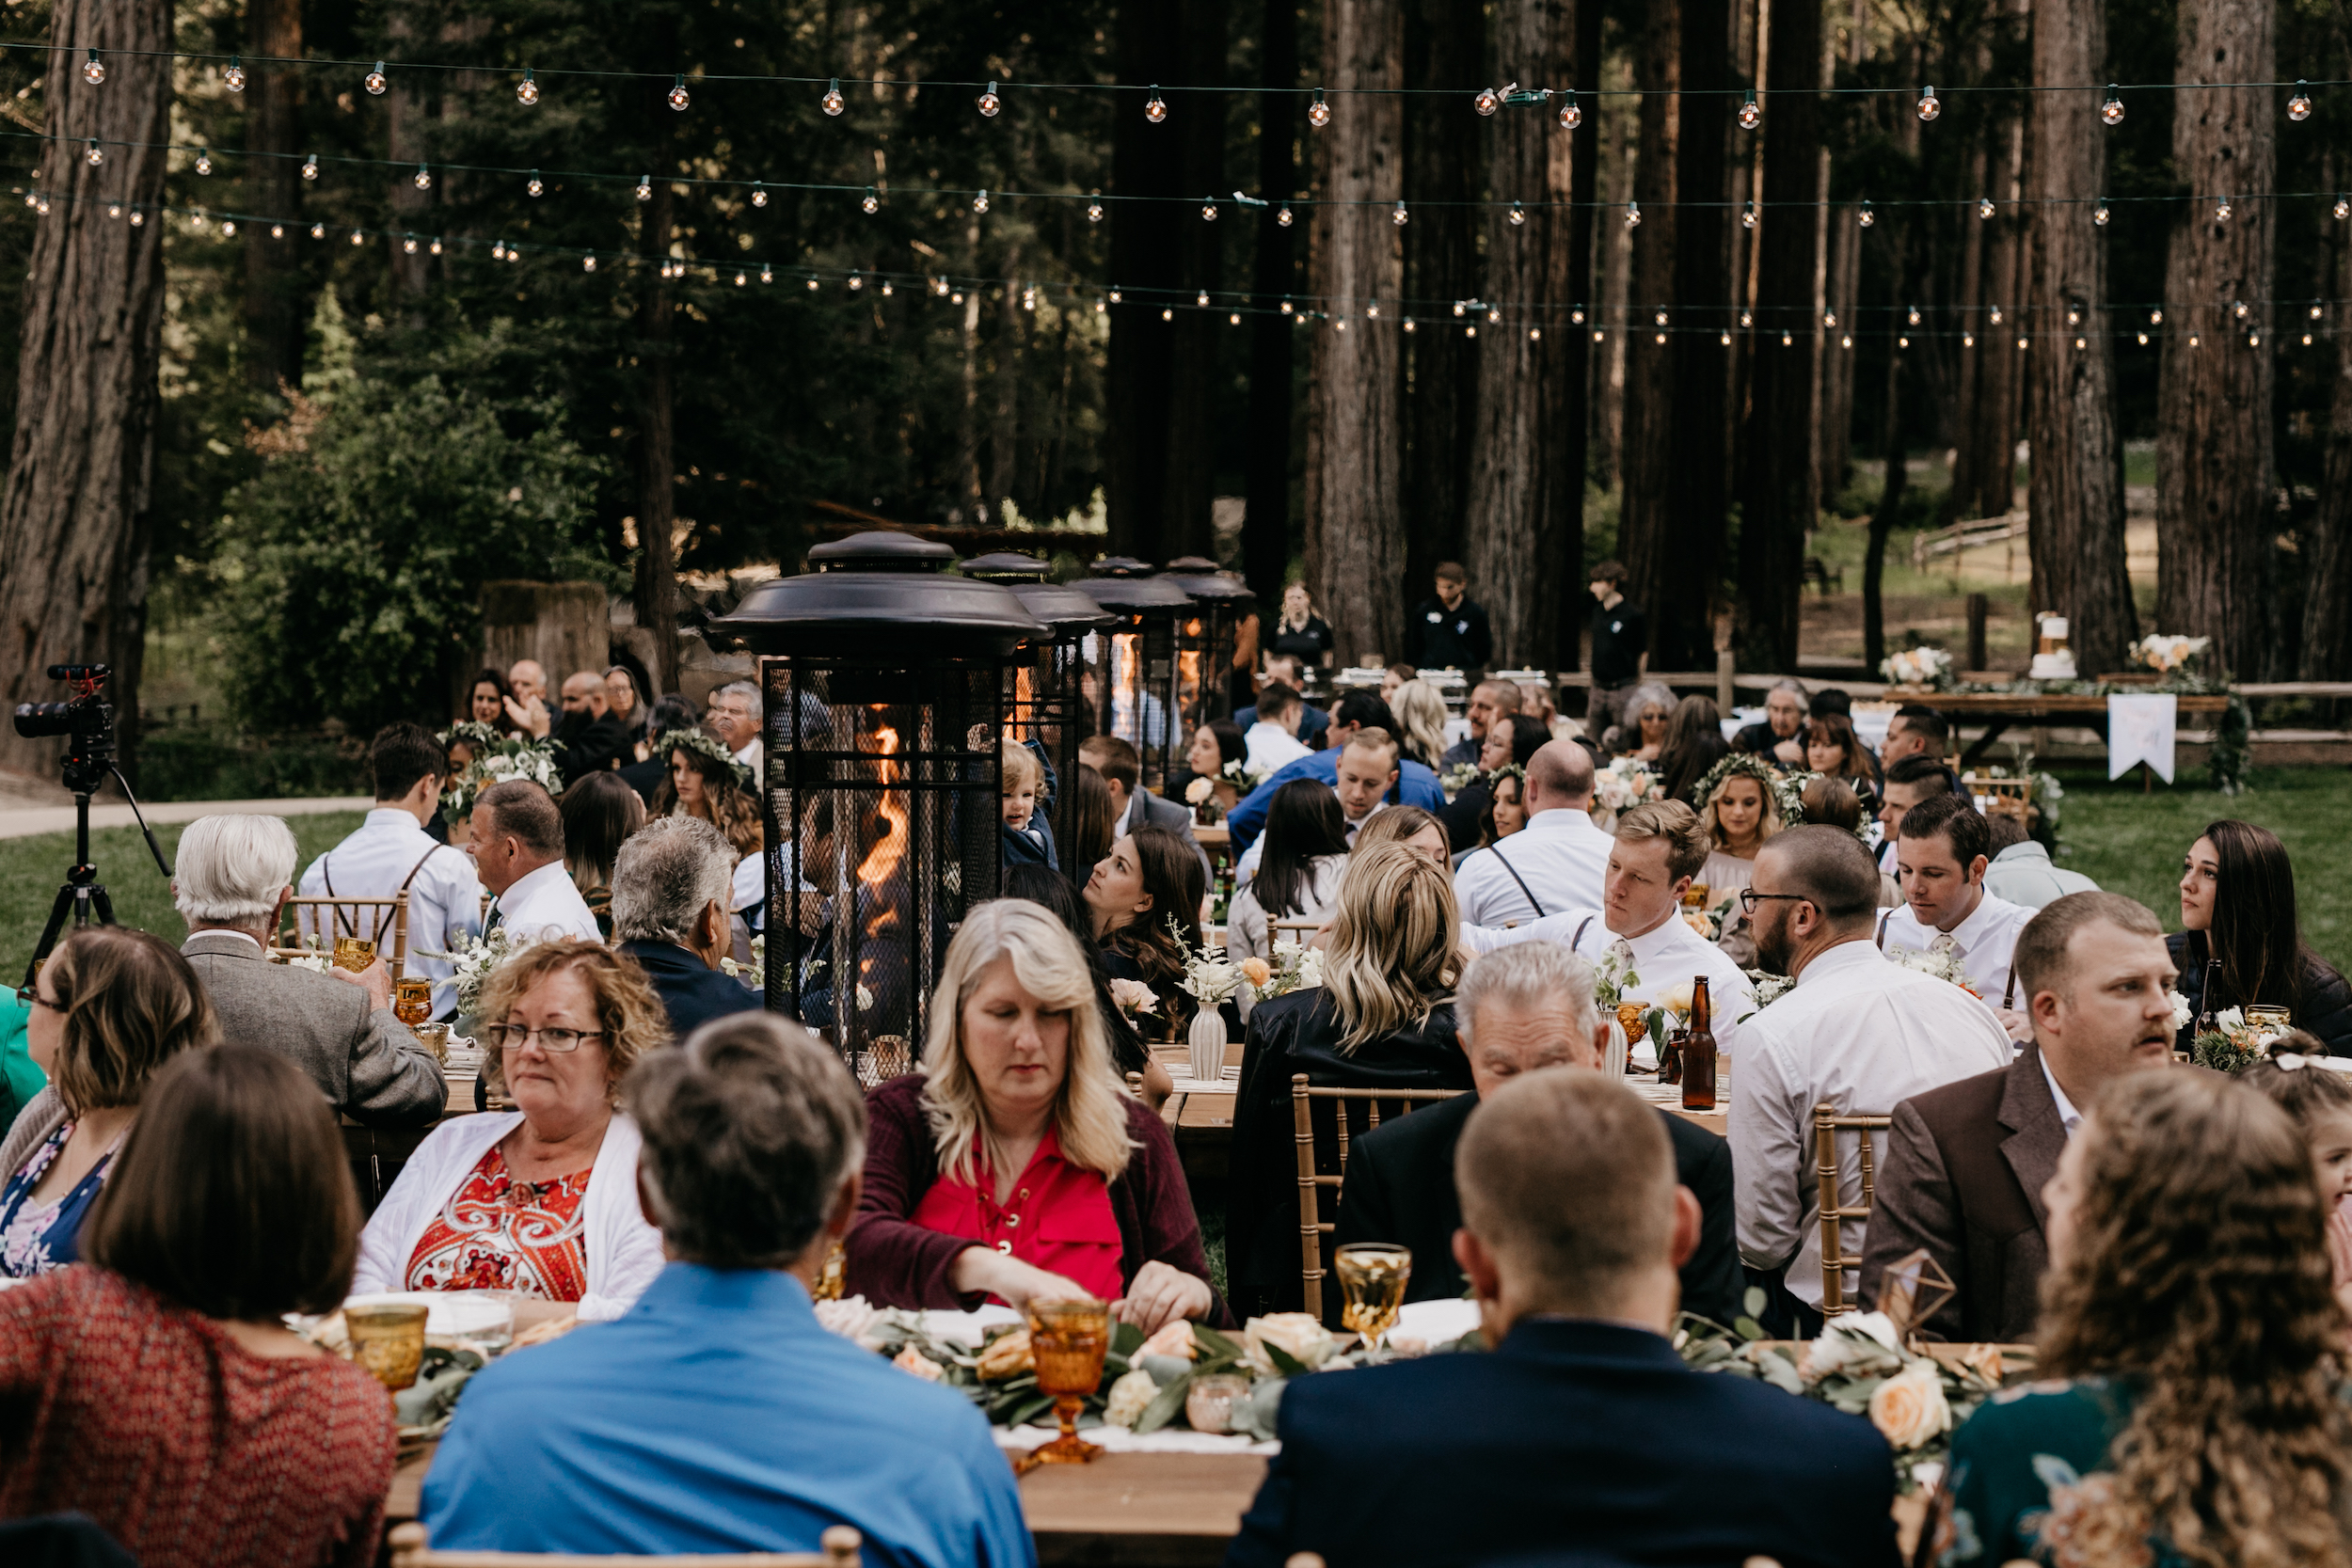 redwoods-wedding-photographer682.jpg